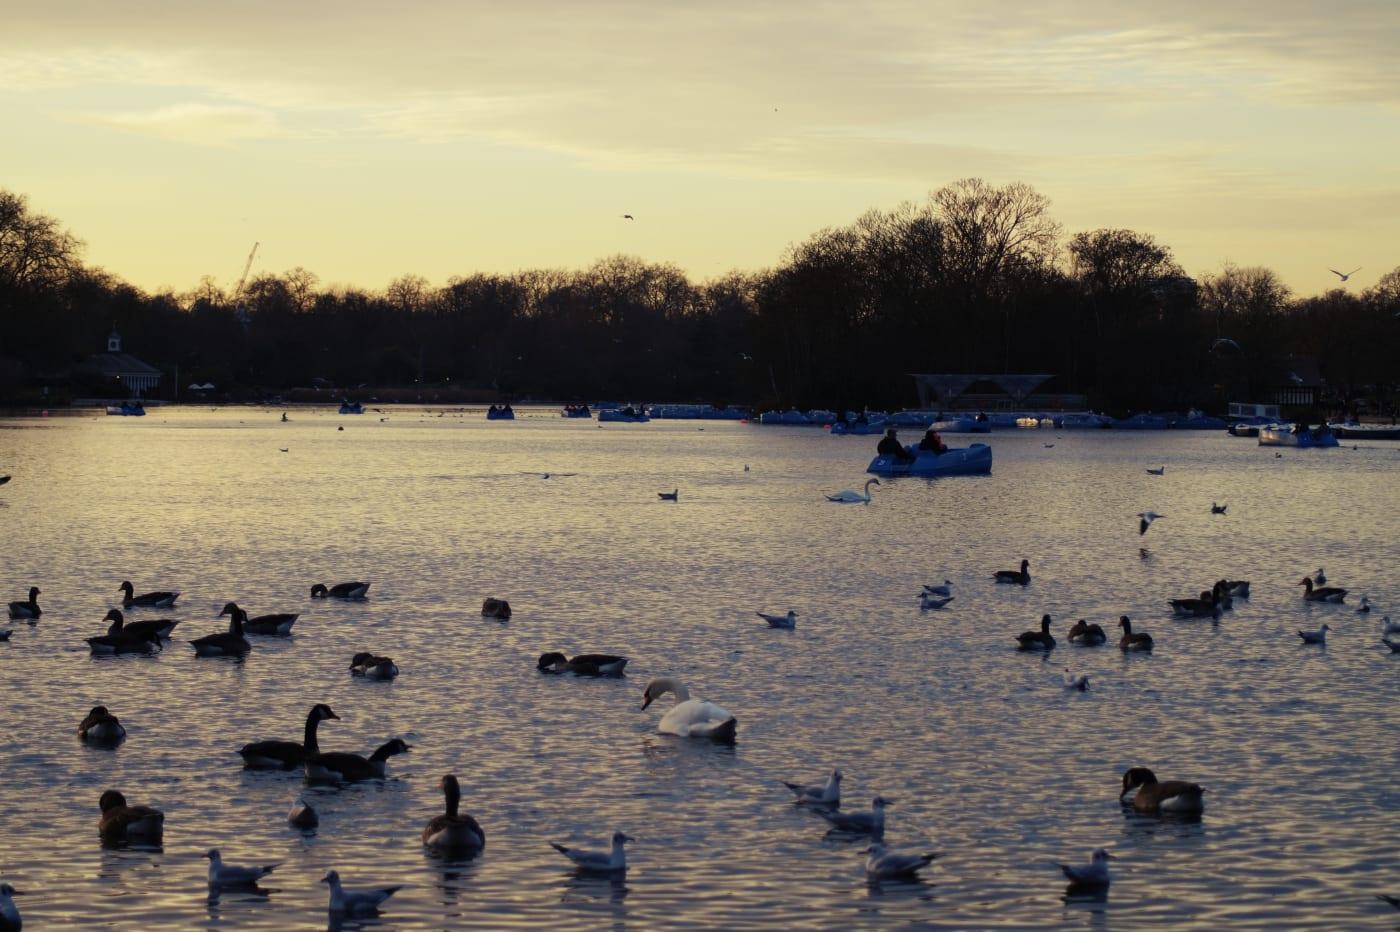 london-hyde-park-tretboot-fahren